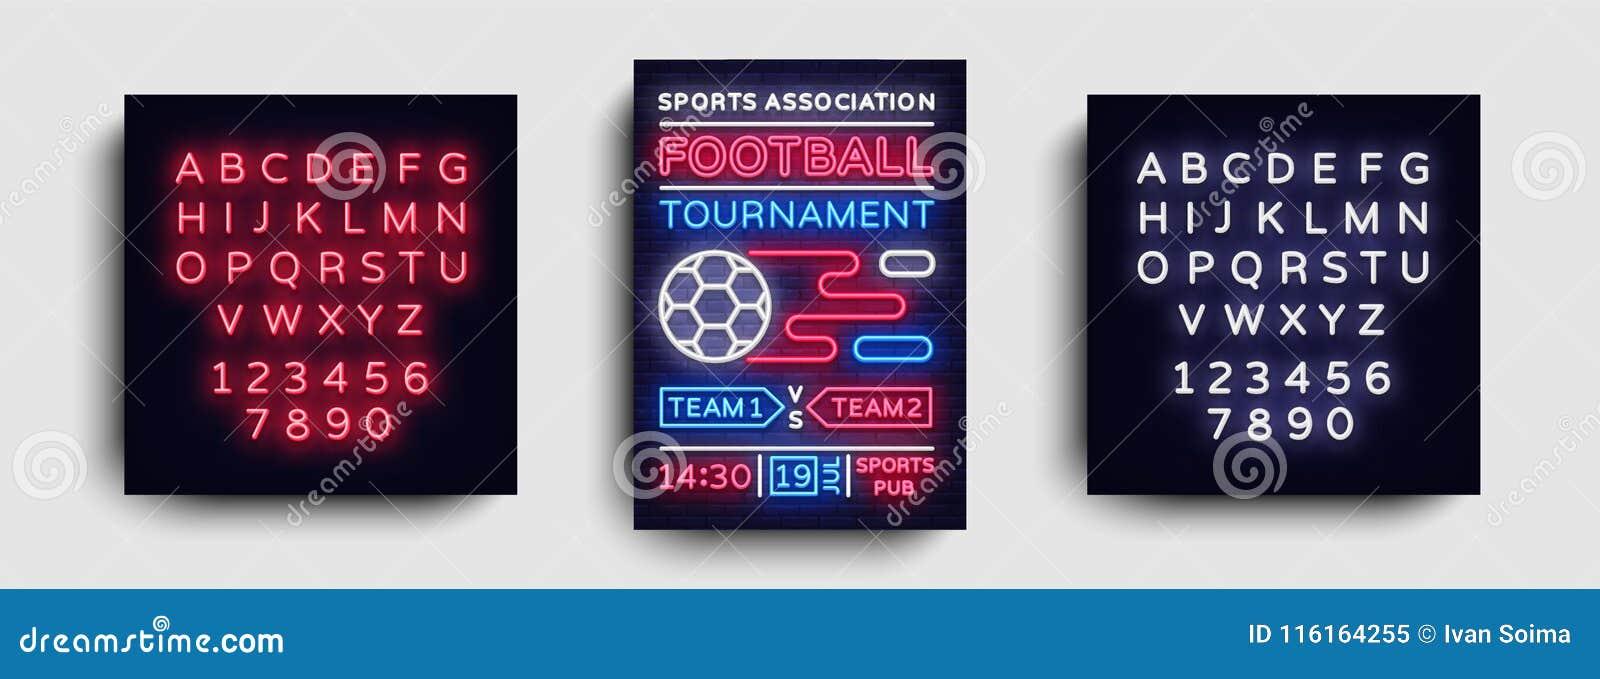 Soccer Tournament Flyer Vector European Football Championship